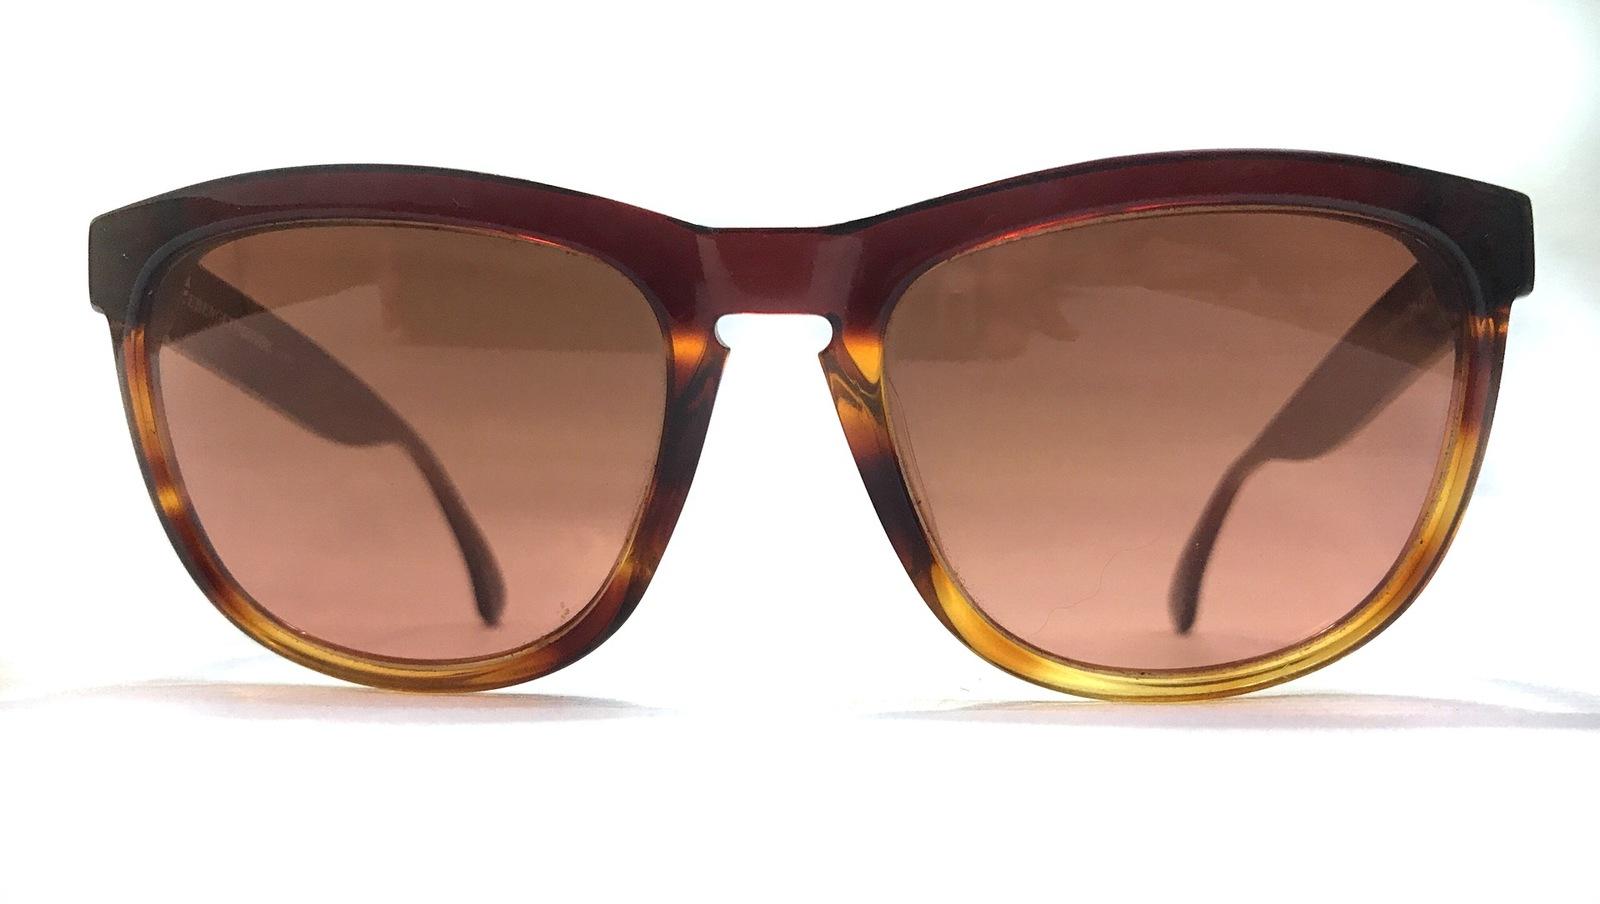 981862c6ccf1a Rare  Serengeti Drivers Sunglasses and 50 similar items